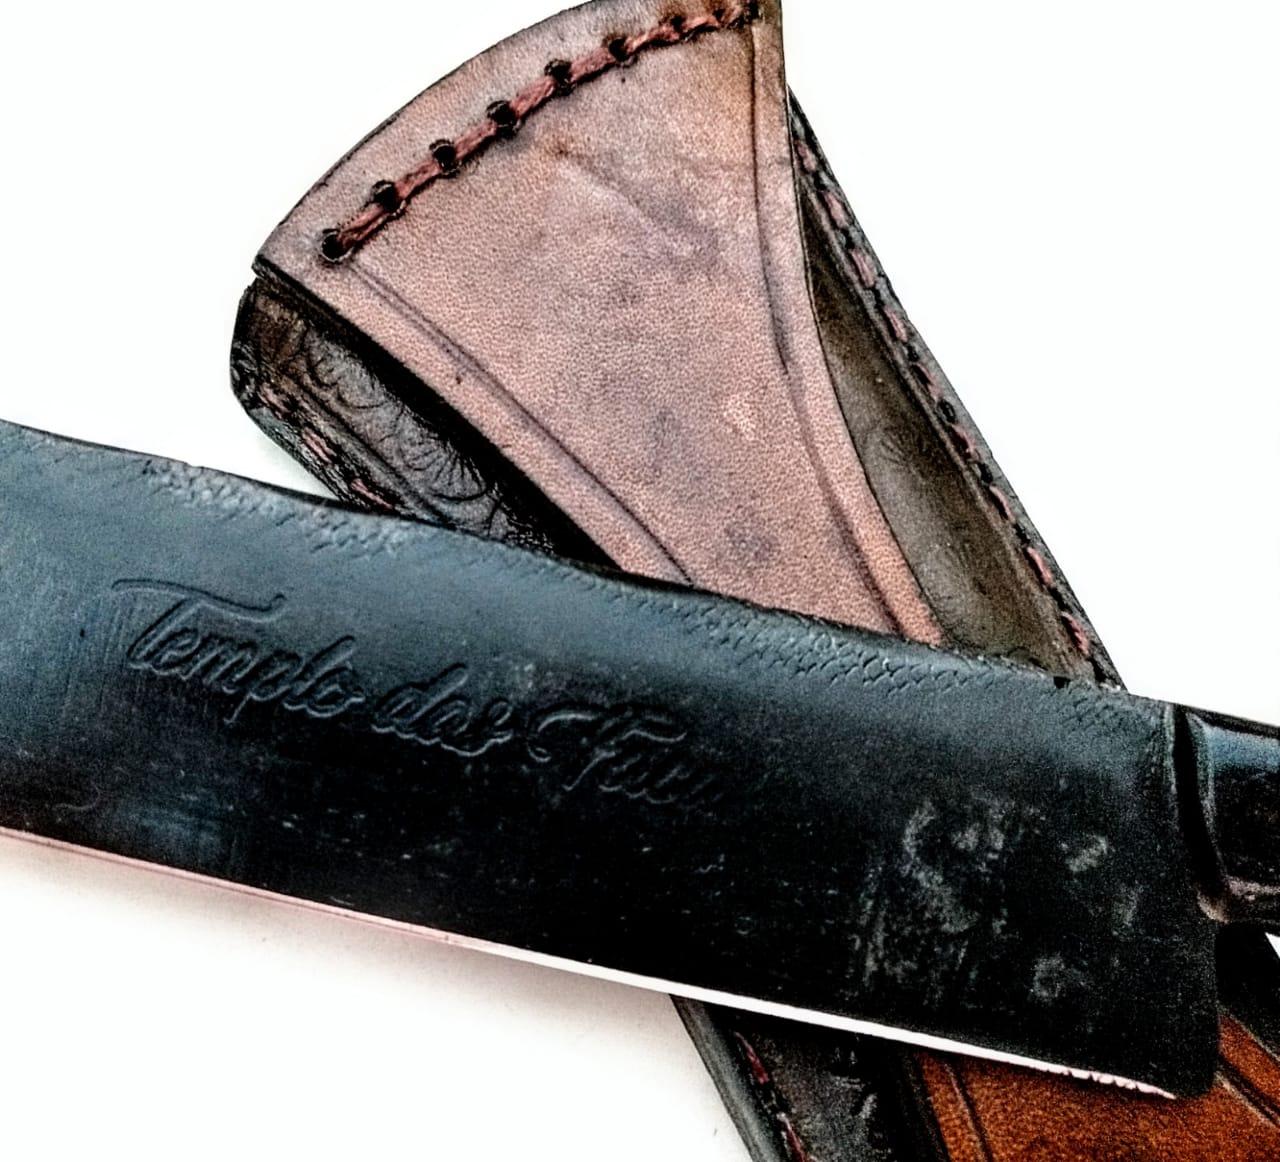 Faca forjada de antiga lima alemã 14 polegadas